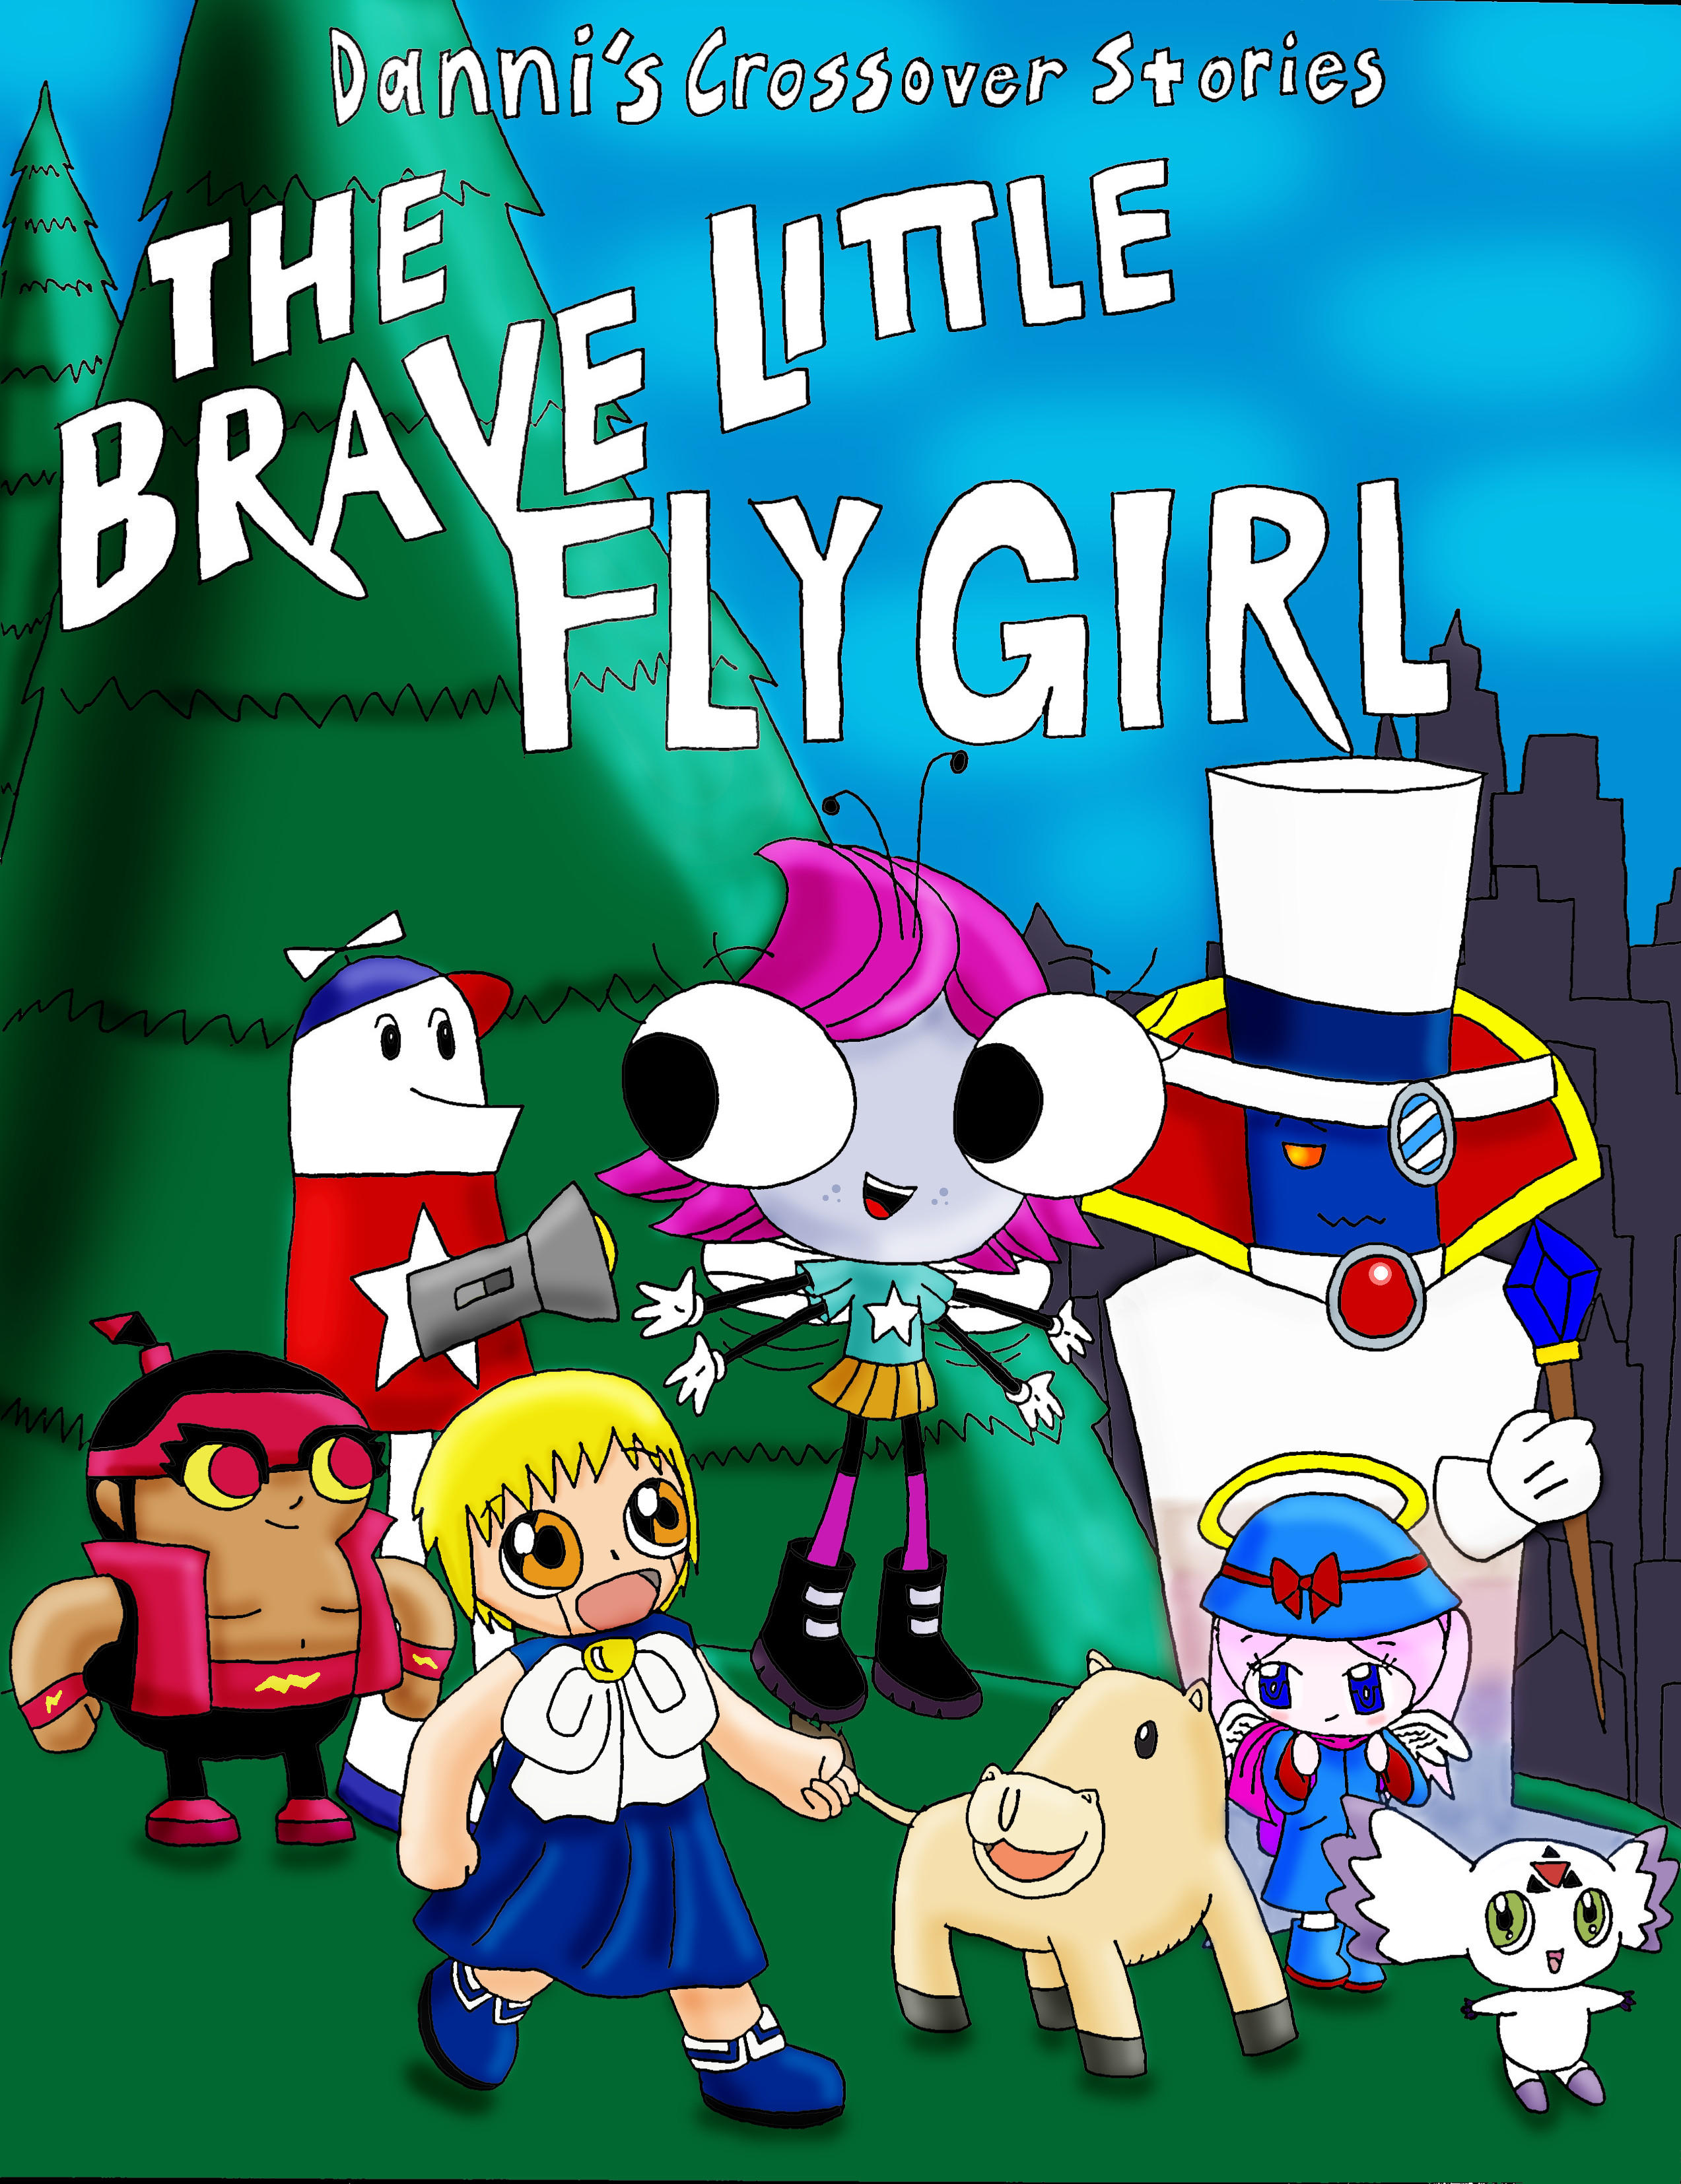 Friends Boy And Girl Wallpaper The Brave Little Flygirl By Dannichangirl On Deviantart